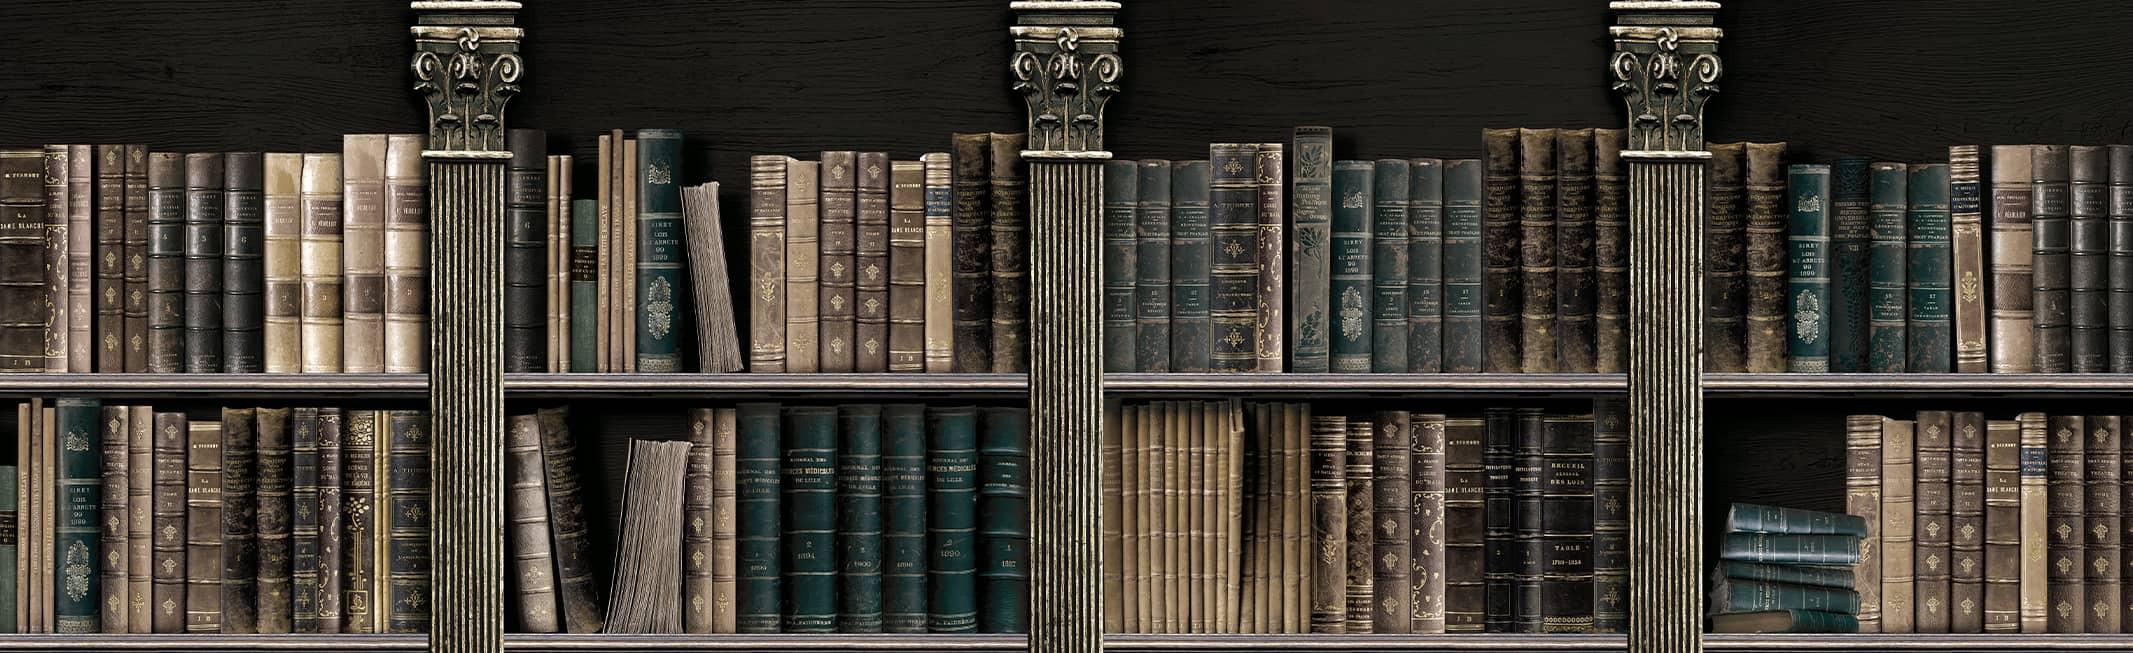 bookshelves murals